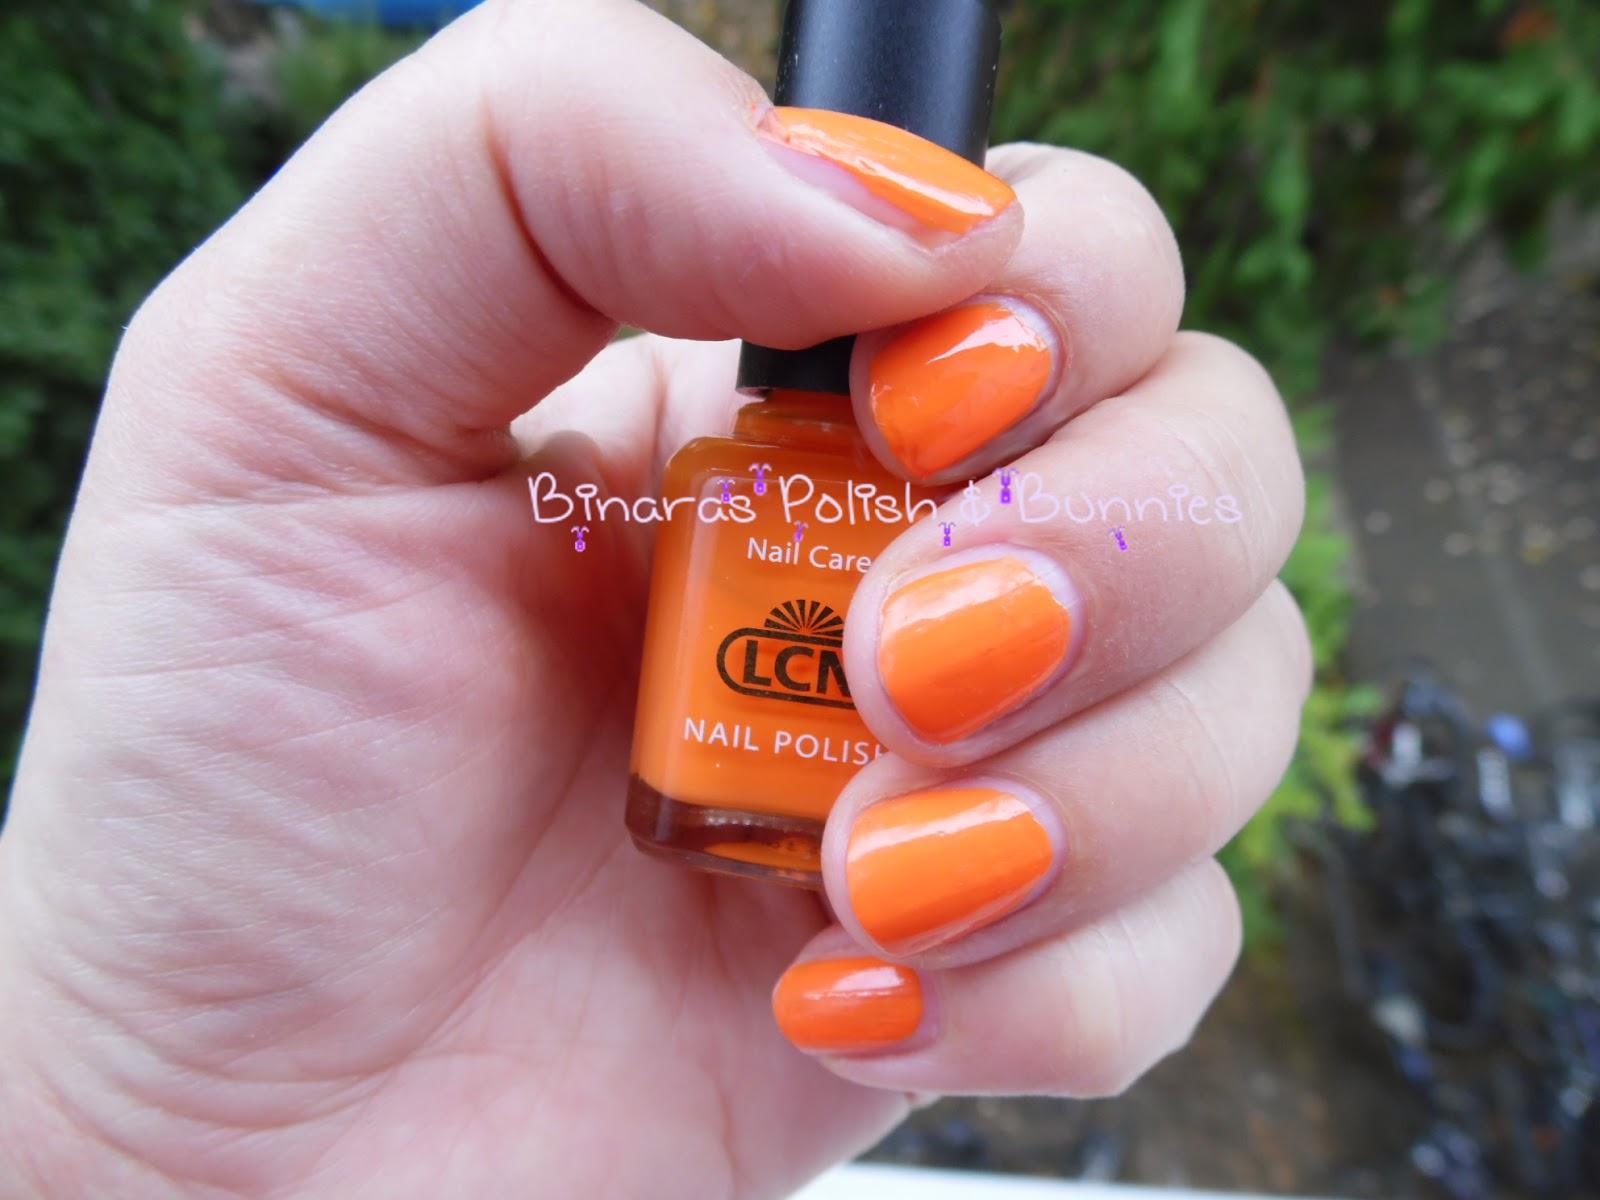 Binara's polish & bunnies: [lacke in farbe ... und bunt 3] runde 3 ...